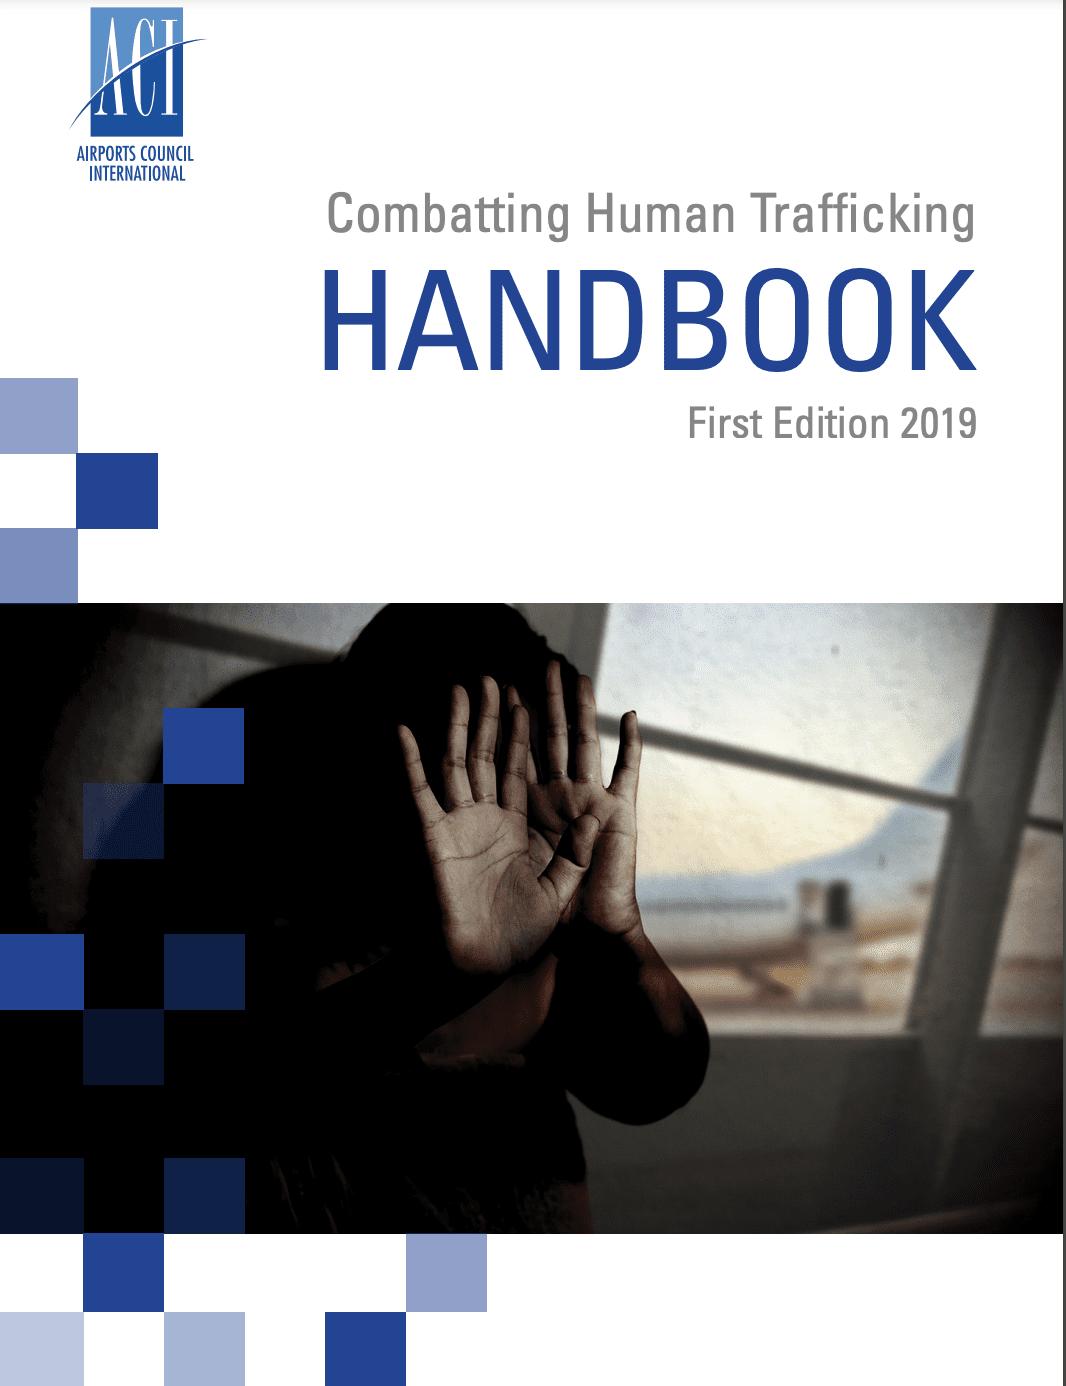 Combatting Human Trafficking Handbook First Edition (2019)